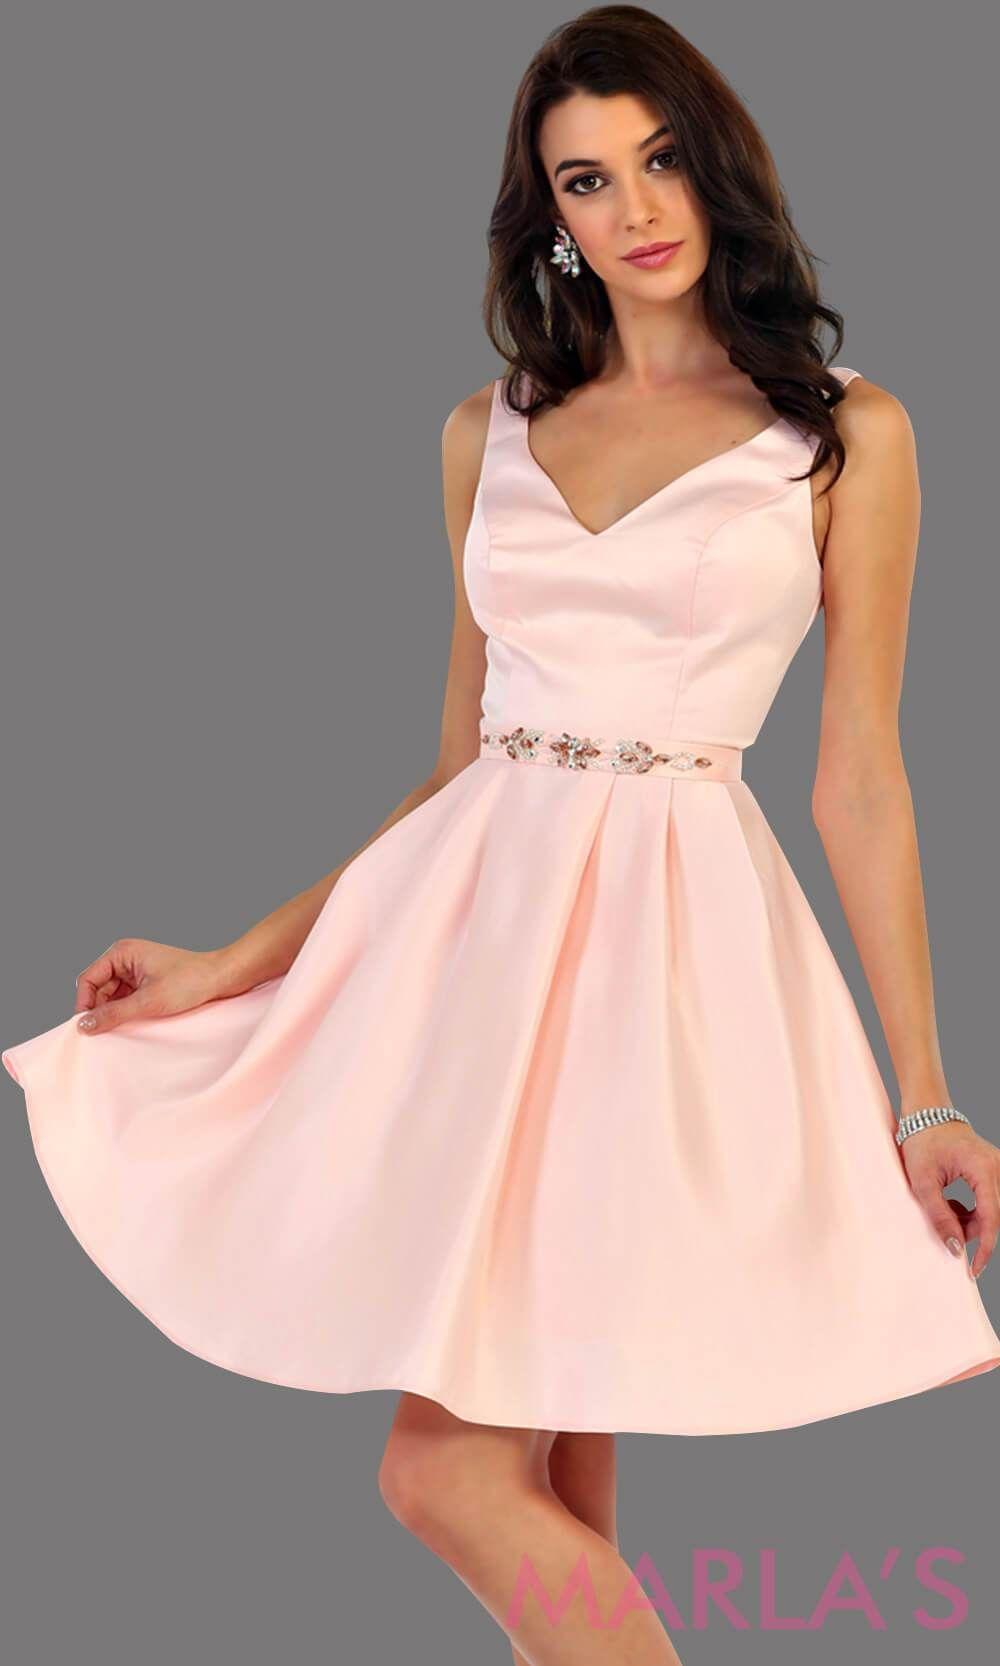 c8239425a5022 1477-Short v neck taffeta light pink grade 8 grad dress with rhinestone  belt. Perfect as a blush confirmation dress, wedding guest dress, graduation  dress, ...